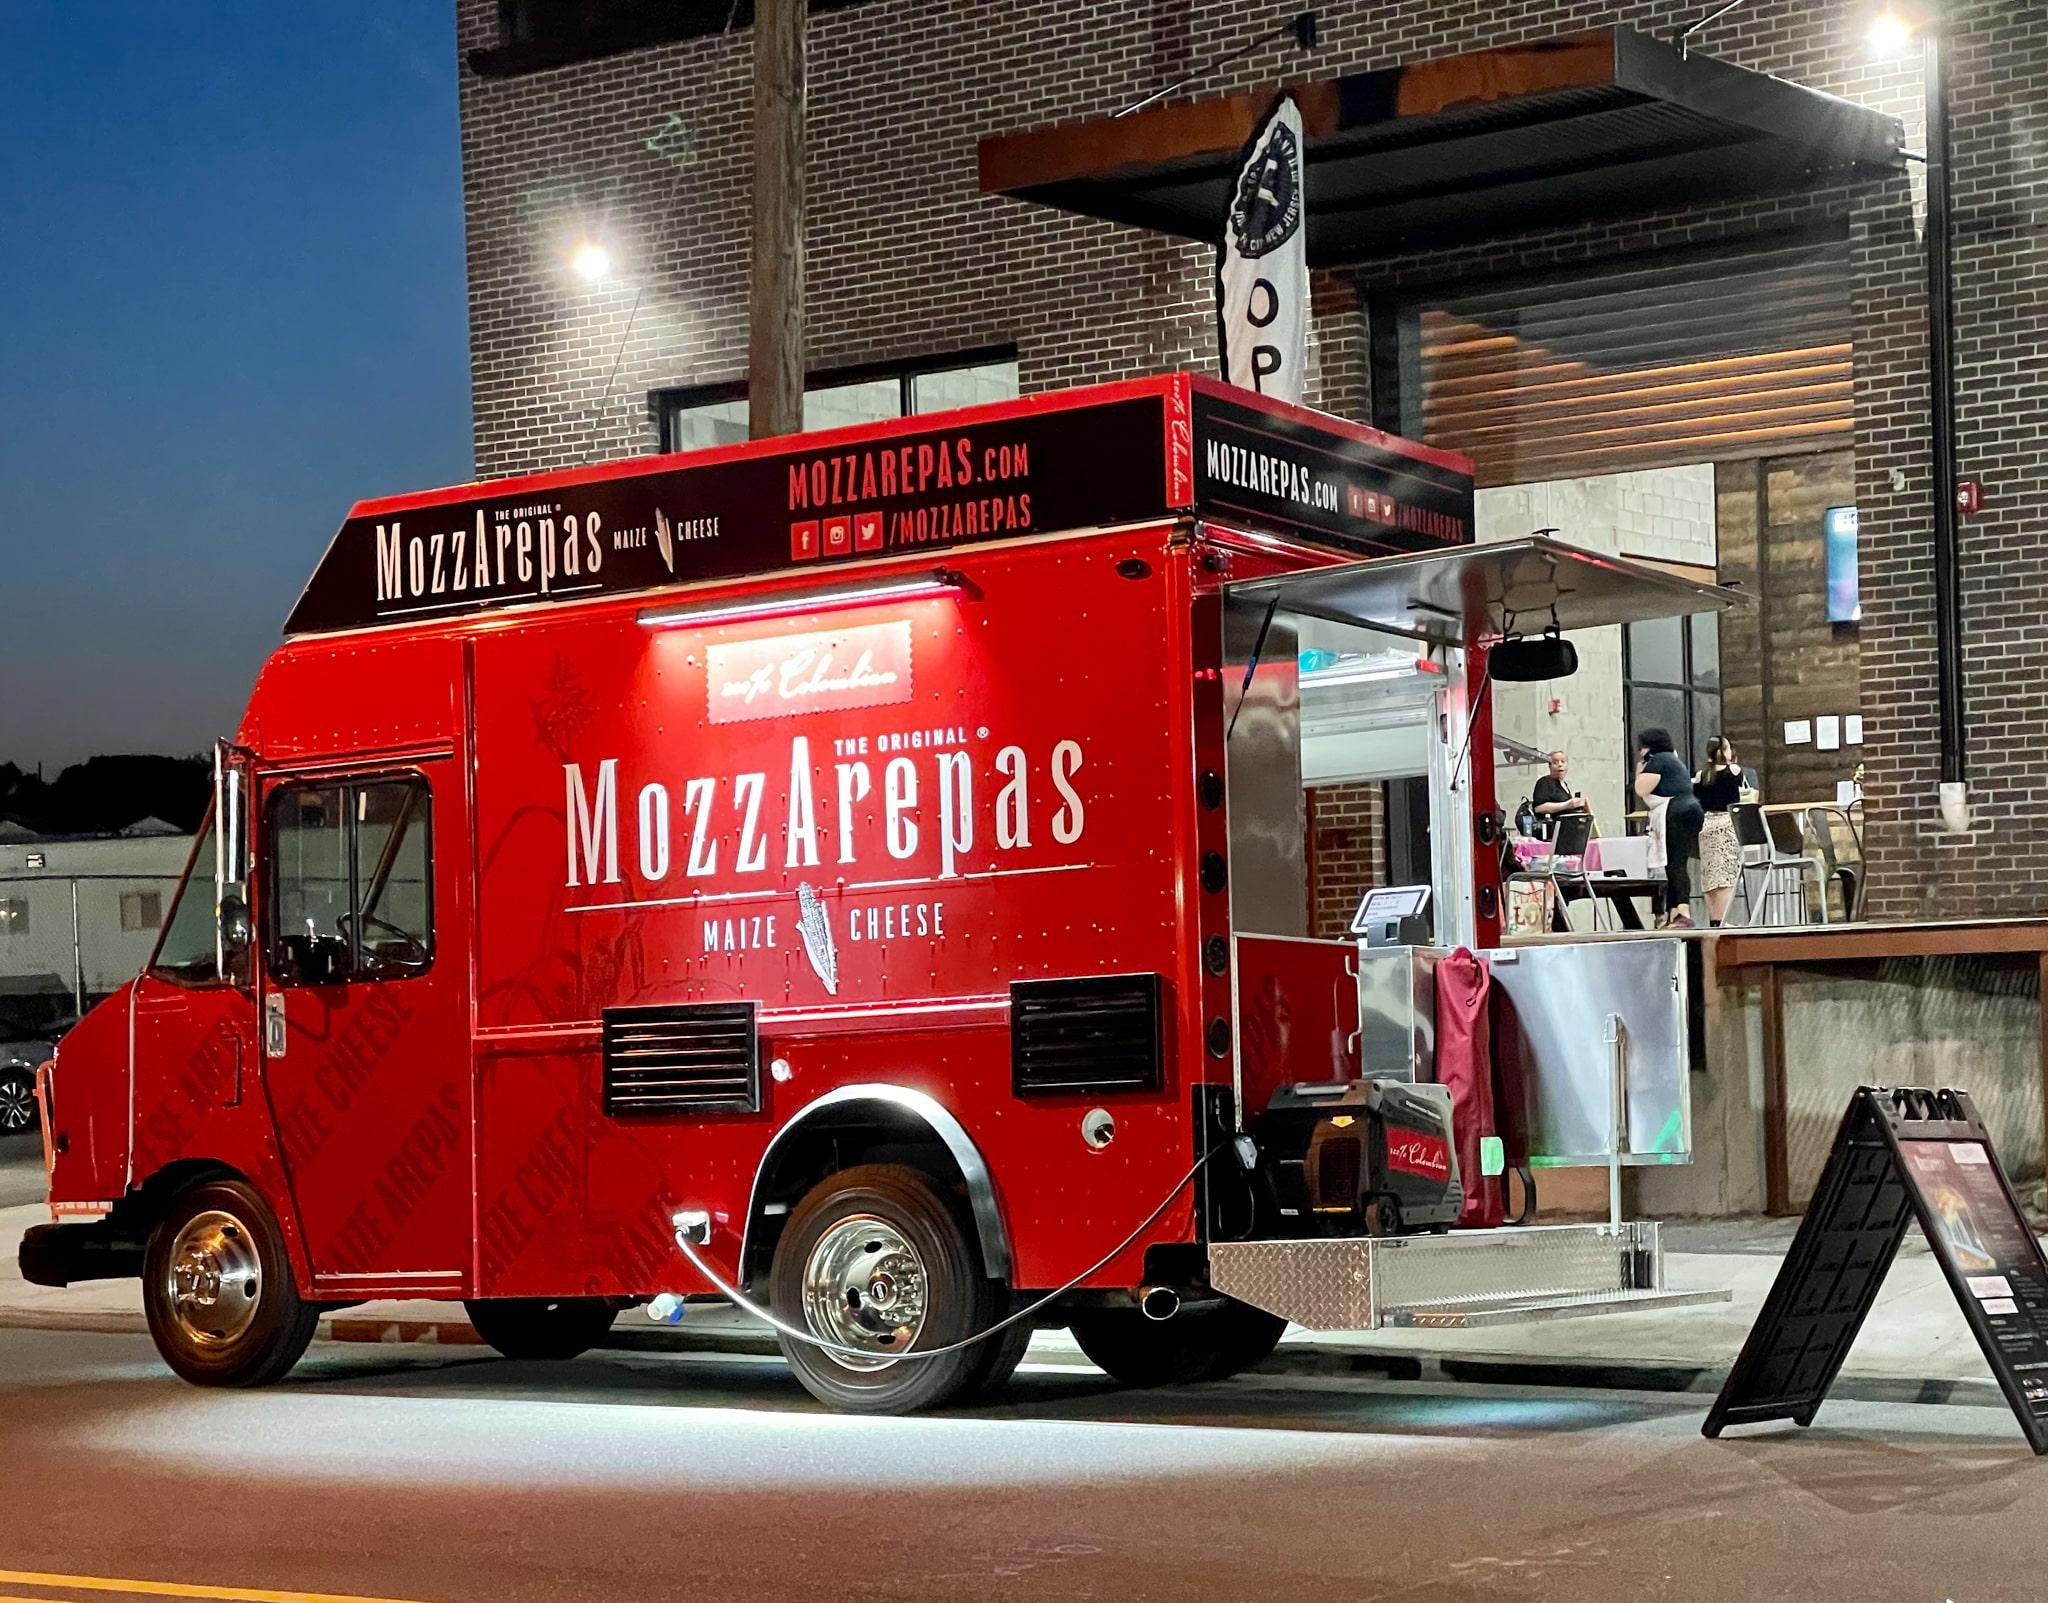 MozzArepas Food Truck